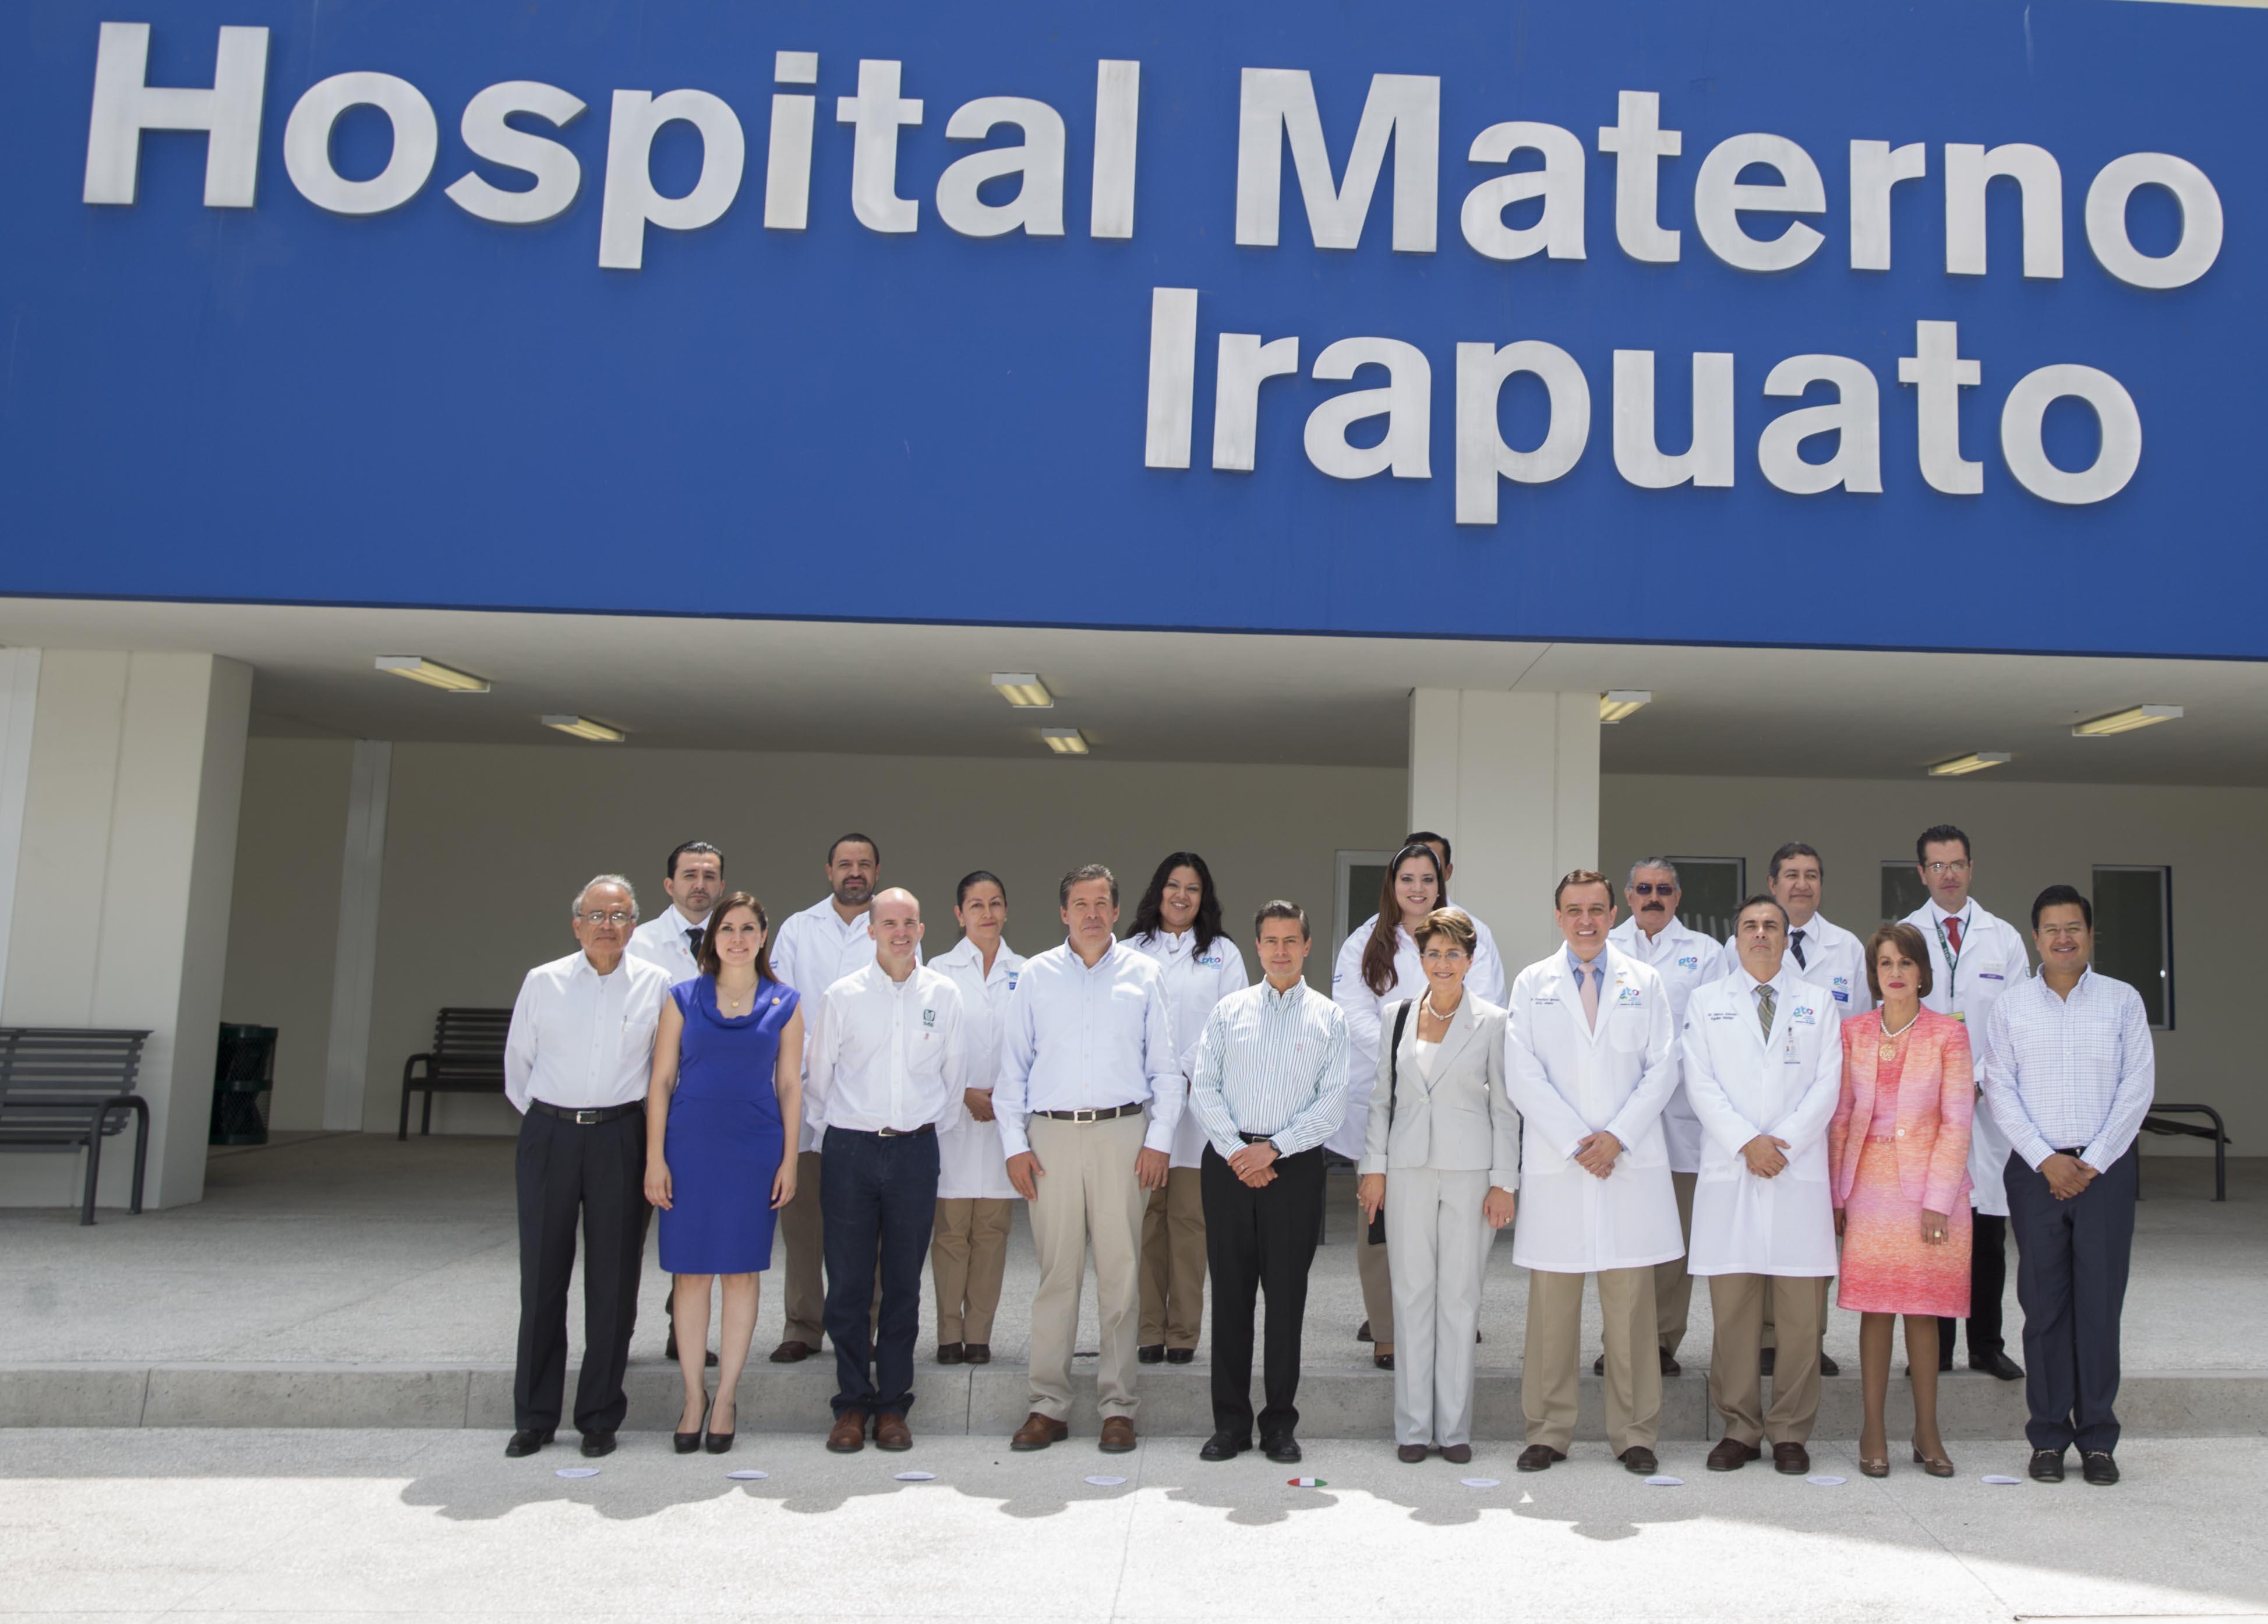 Inauguraci n del hospital materno infantil de irapuato - Hospital materno infantil la paz ...